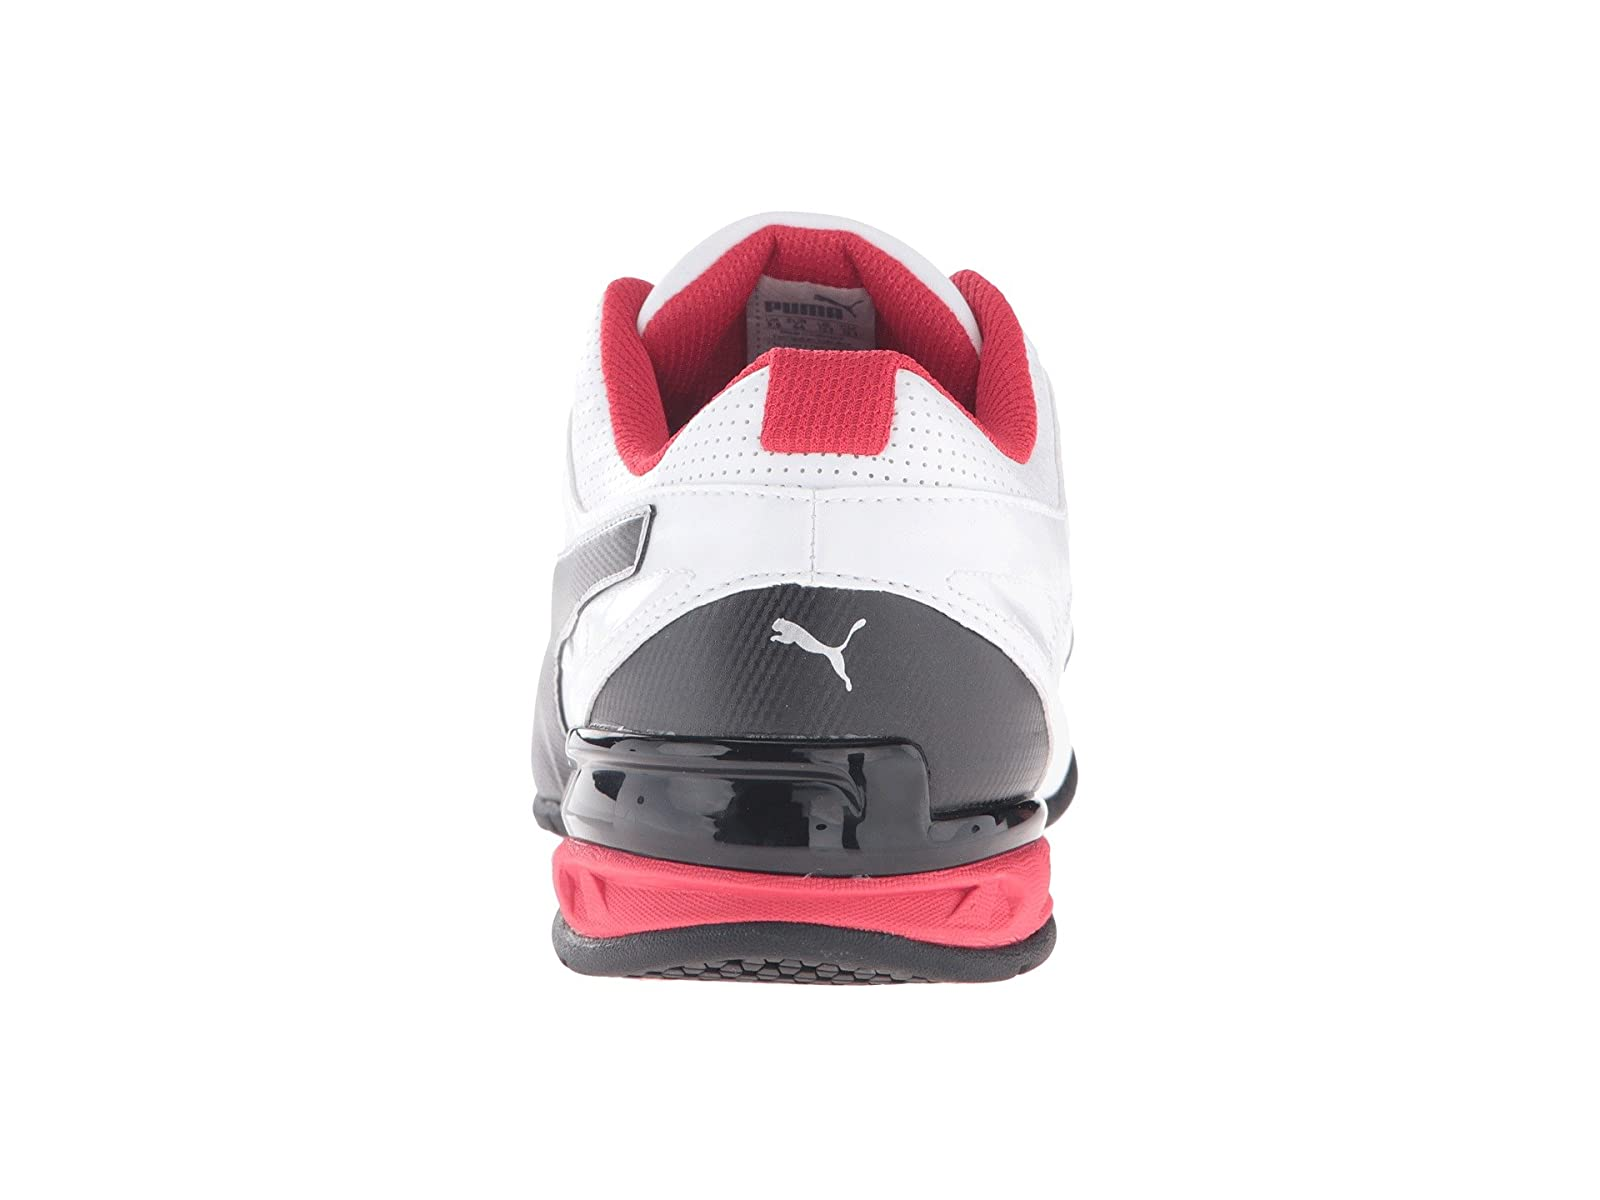 Men-039-s-Scarpe-Da-Ginnastica-amp-Athletic-Shoes-Puma-Tazon-6-FM miniatura 20